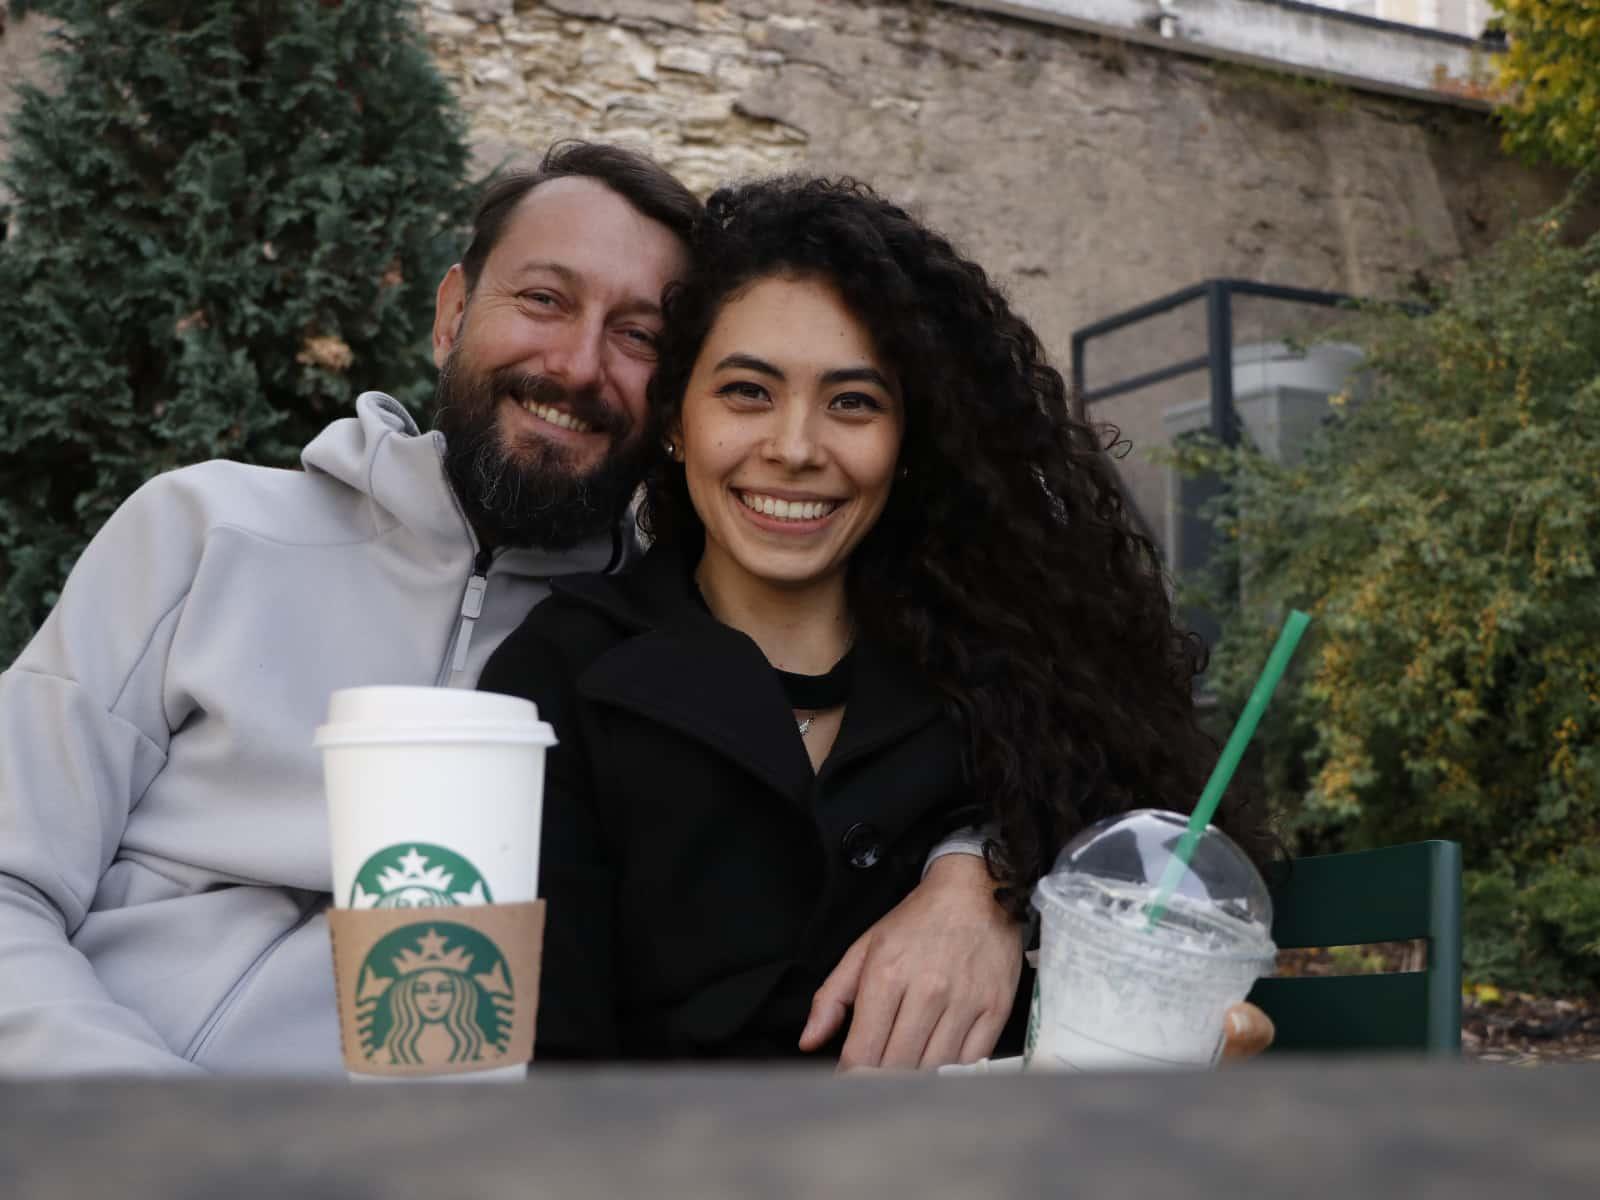 Flavia & Luiz ricardo from São Caetano do Sul, Brazil